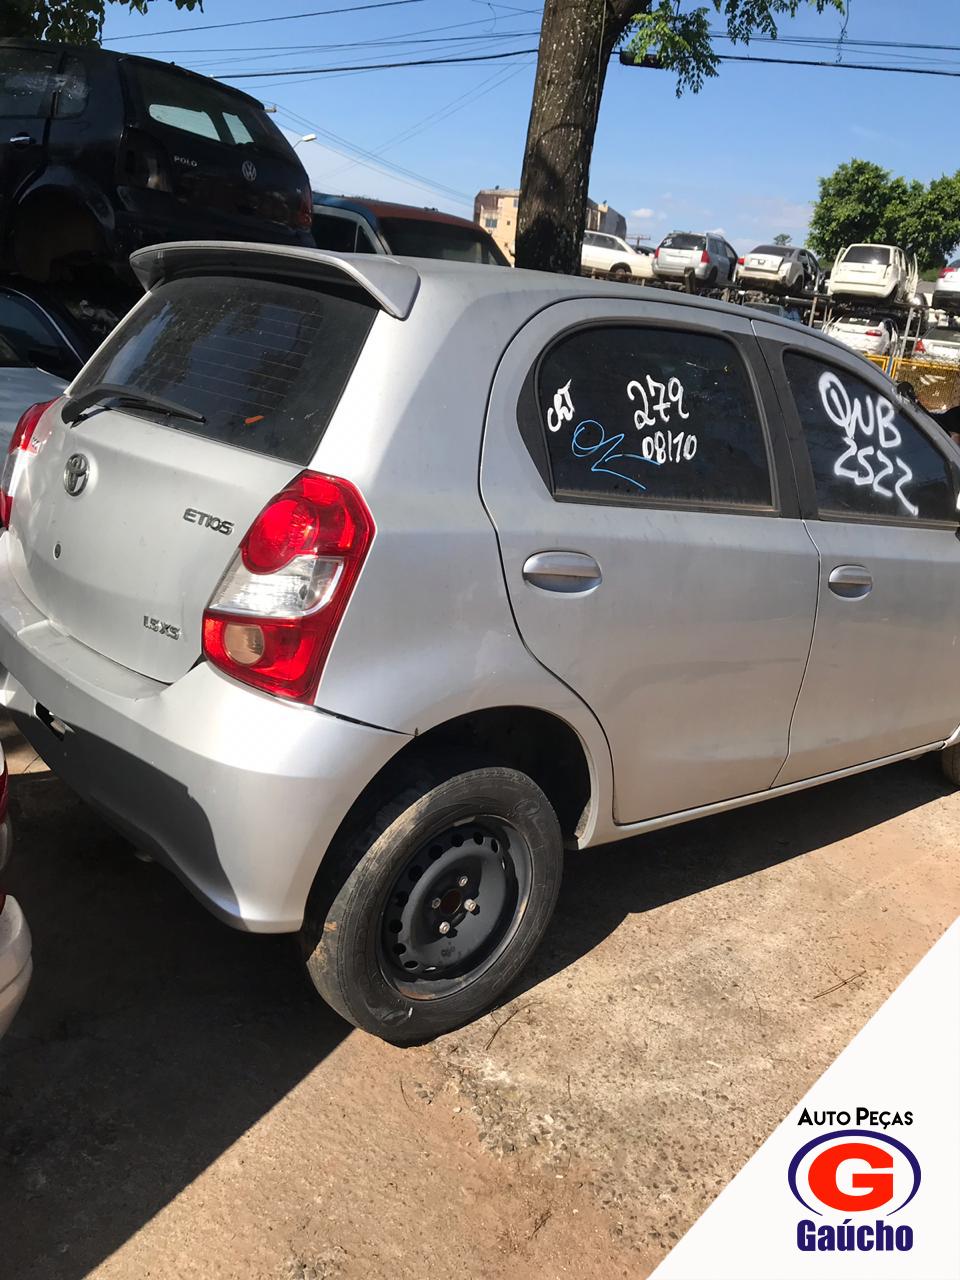 SUCATA ETIOS 2017 1.5 107CV FLEX CAMBIO AUTOMATICO